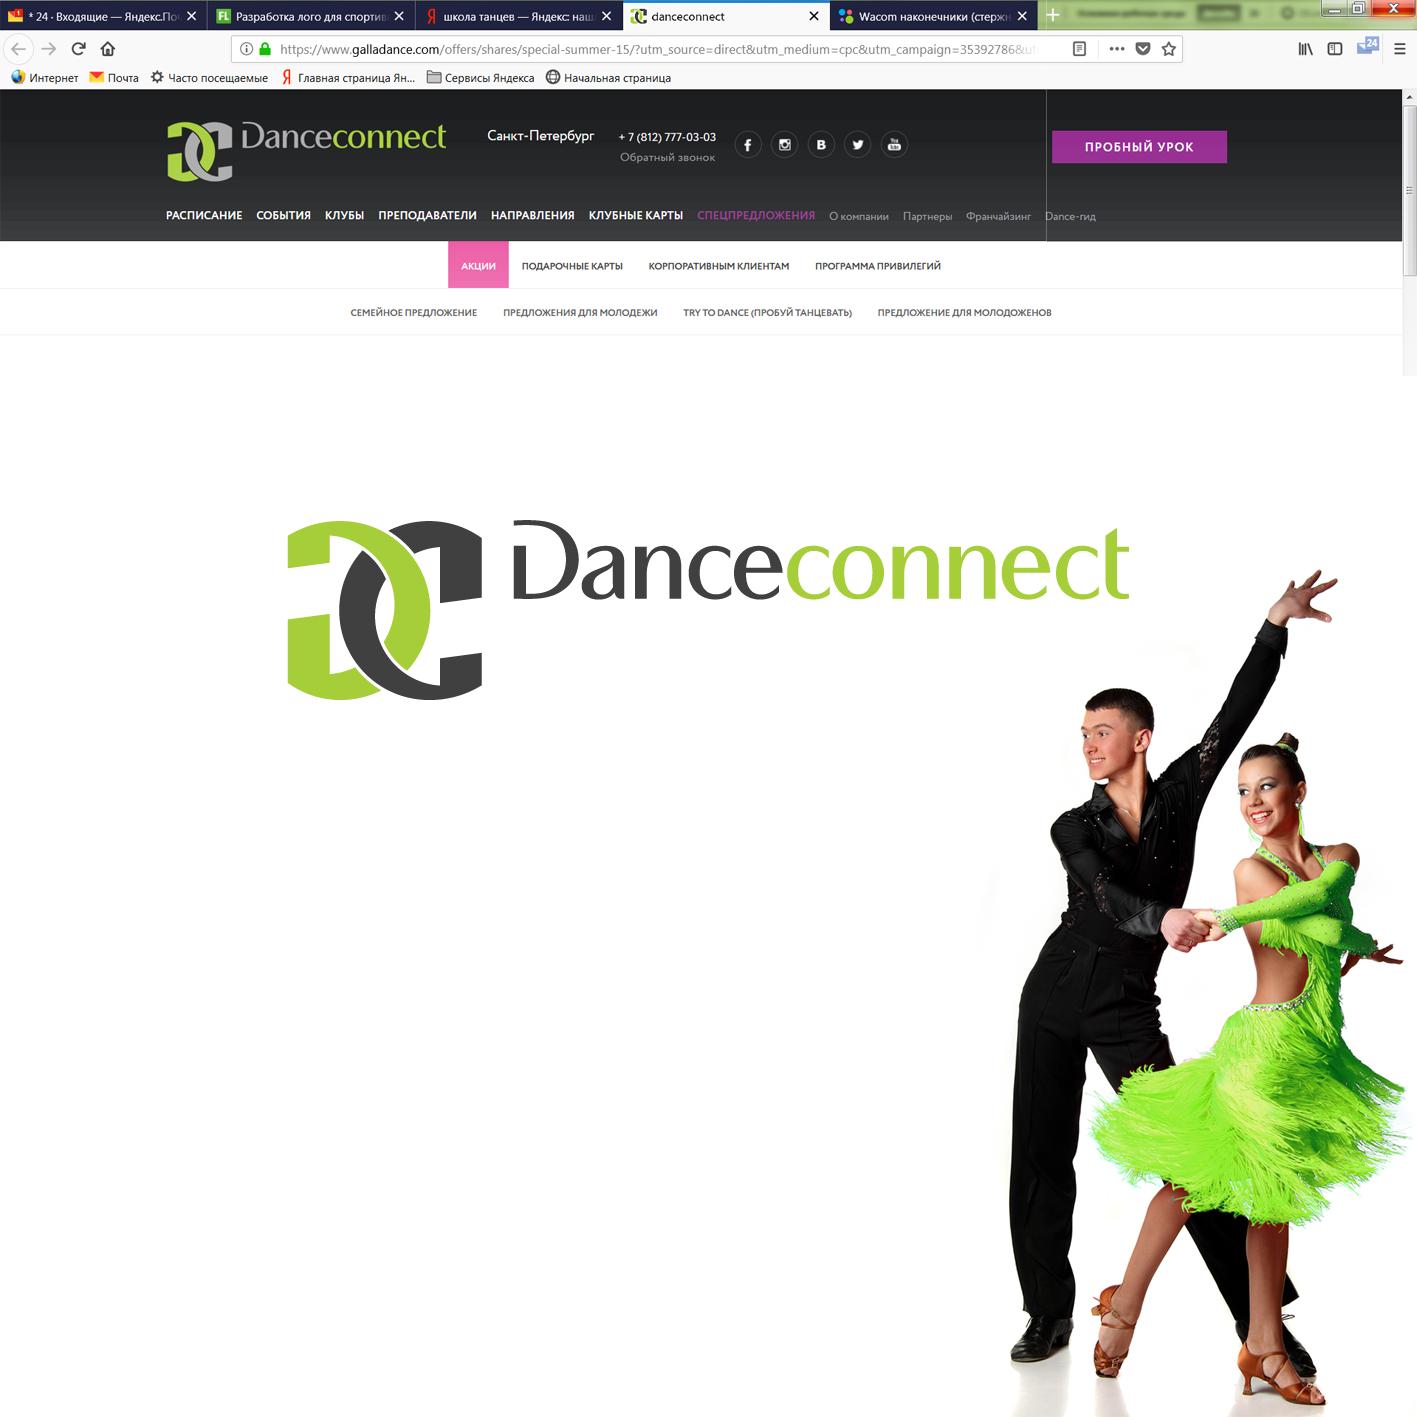 Разработка лого для спортивного портала www.danceconnect.ru фото f_8685b40919f290b5.png